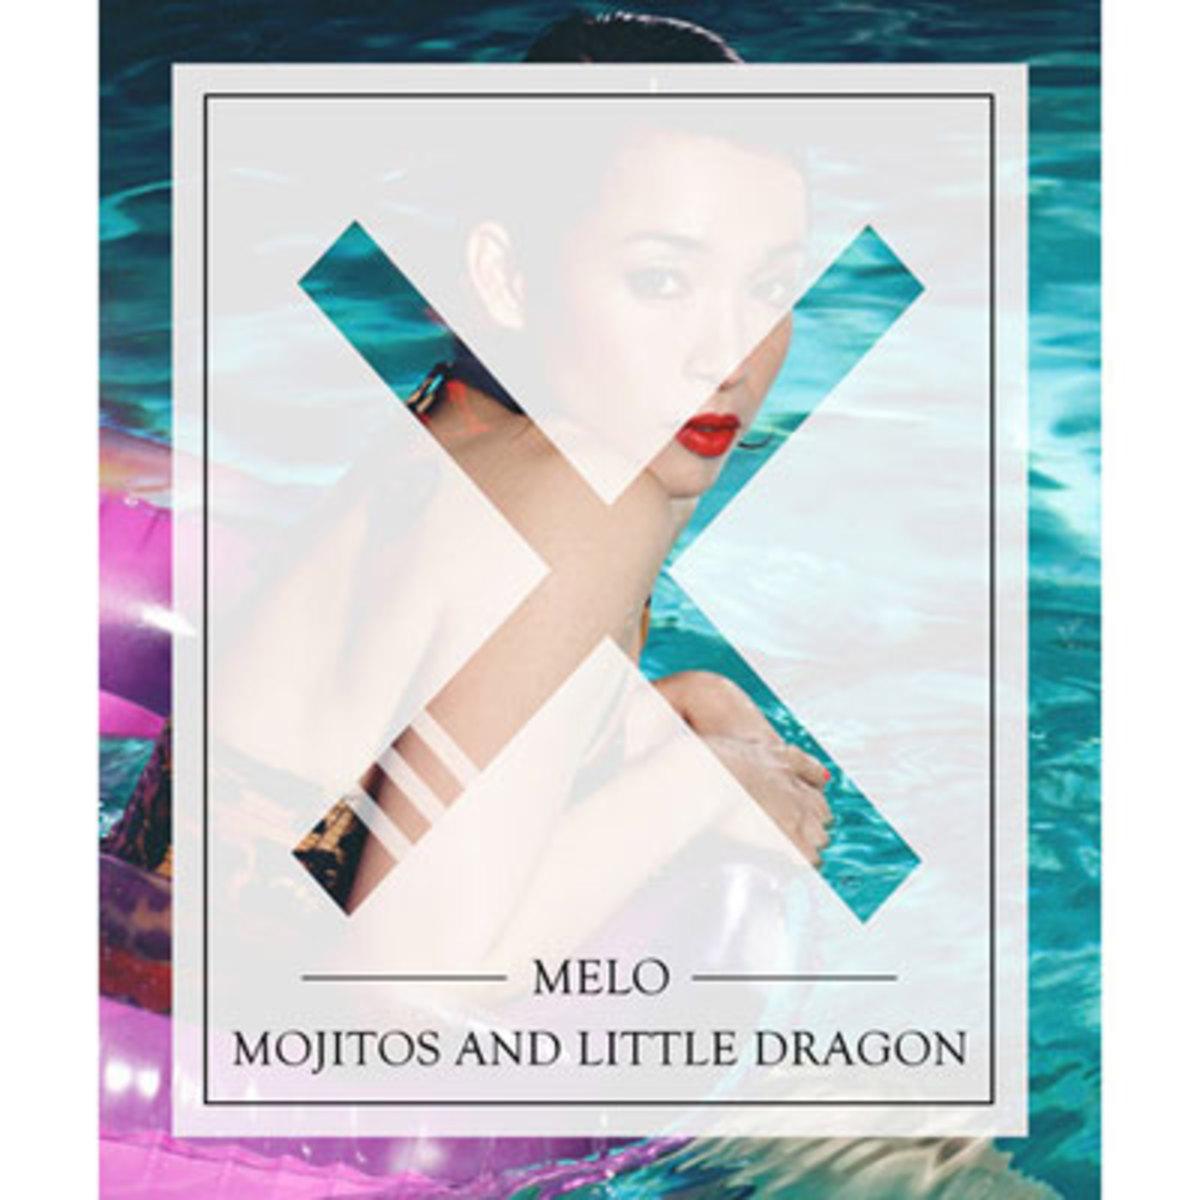 melox-mojitoslittle.jpg